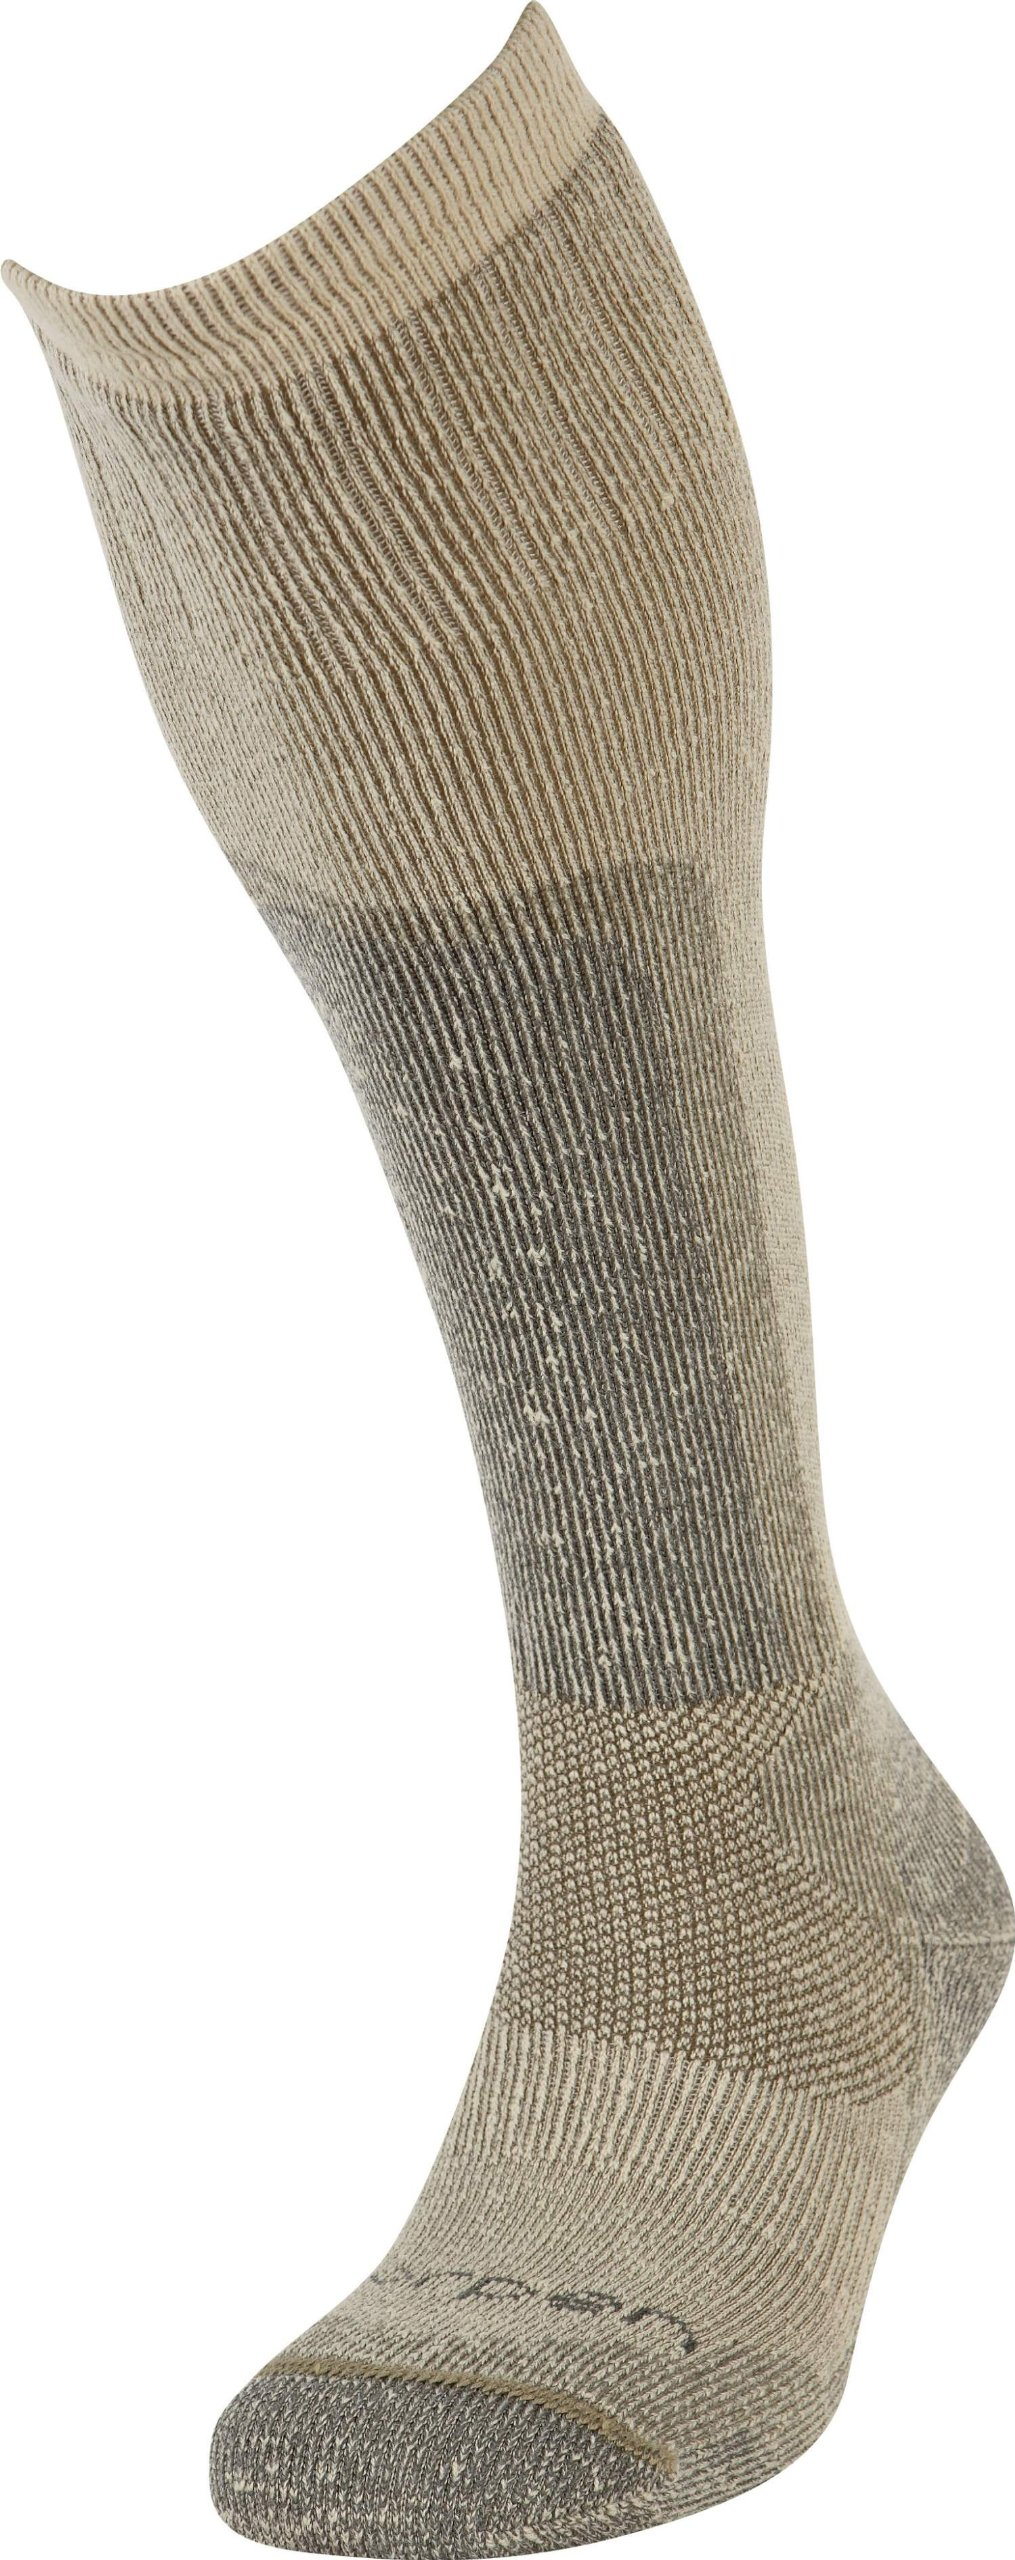 Lorpen Hunting Super Heavy Socks (Desert, X-Large) by Lorpen